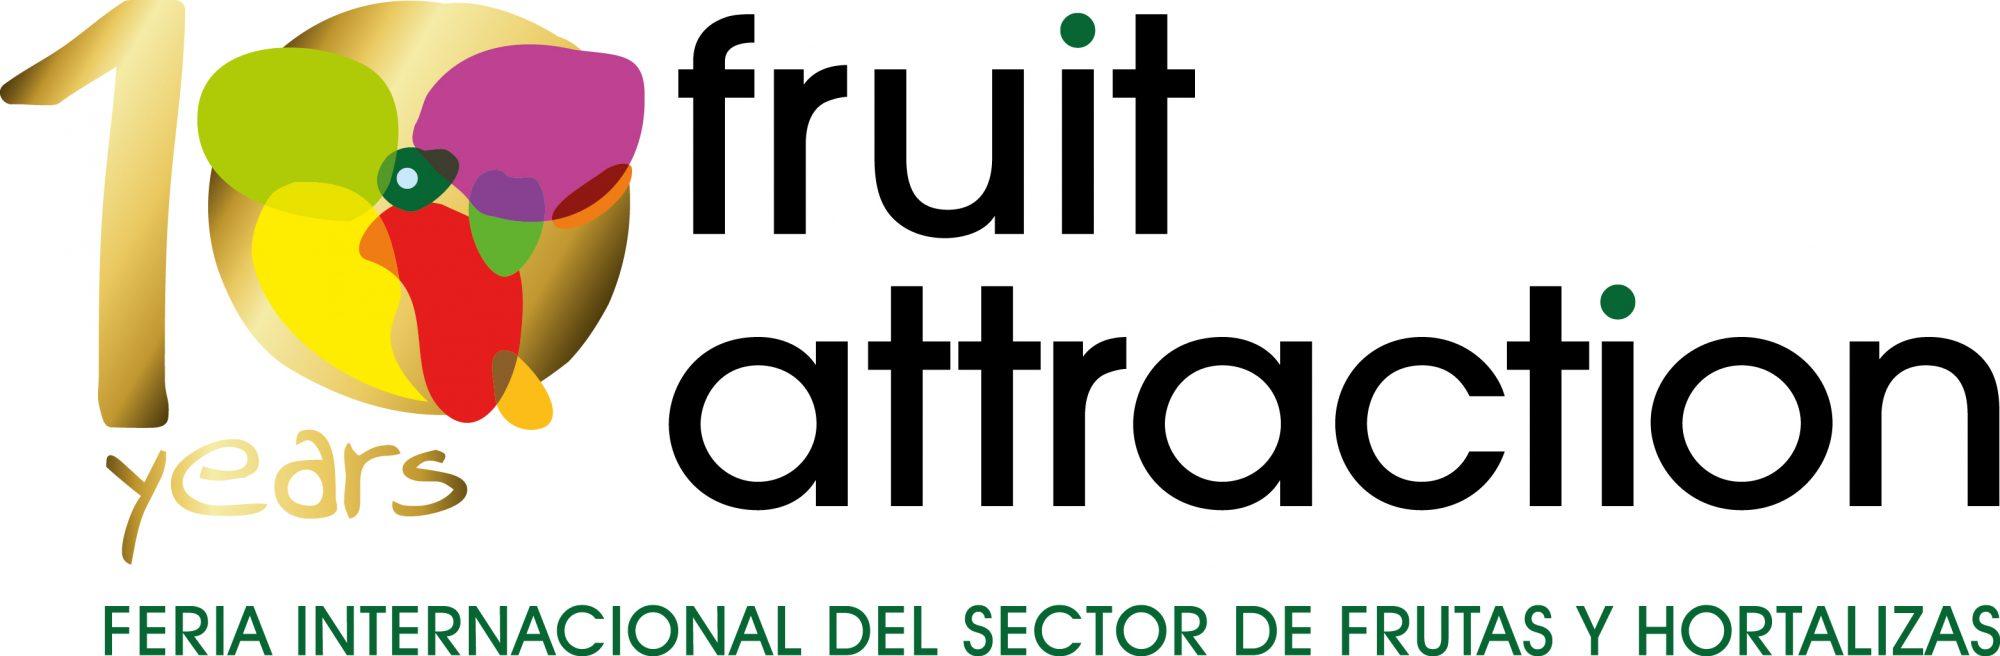 J. Huesa Water Technology estará presente como expositor en la 10ª edición Fruit Attraction.